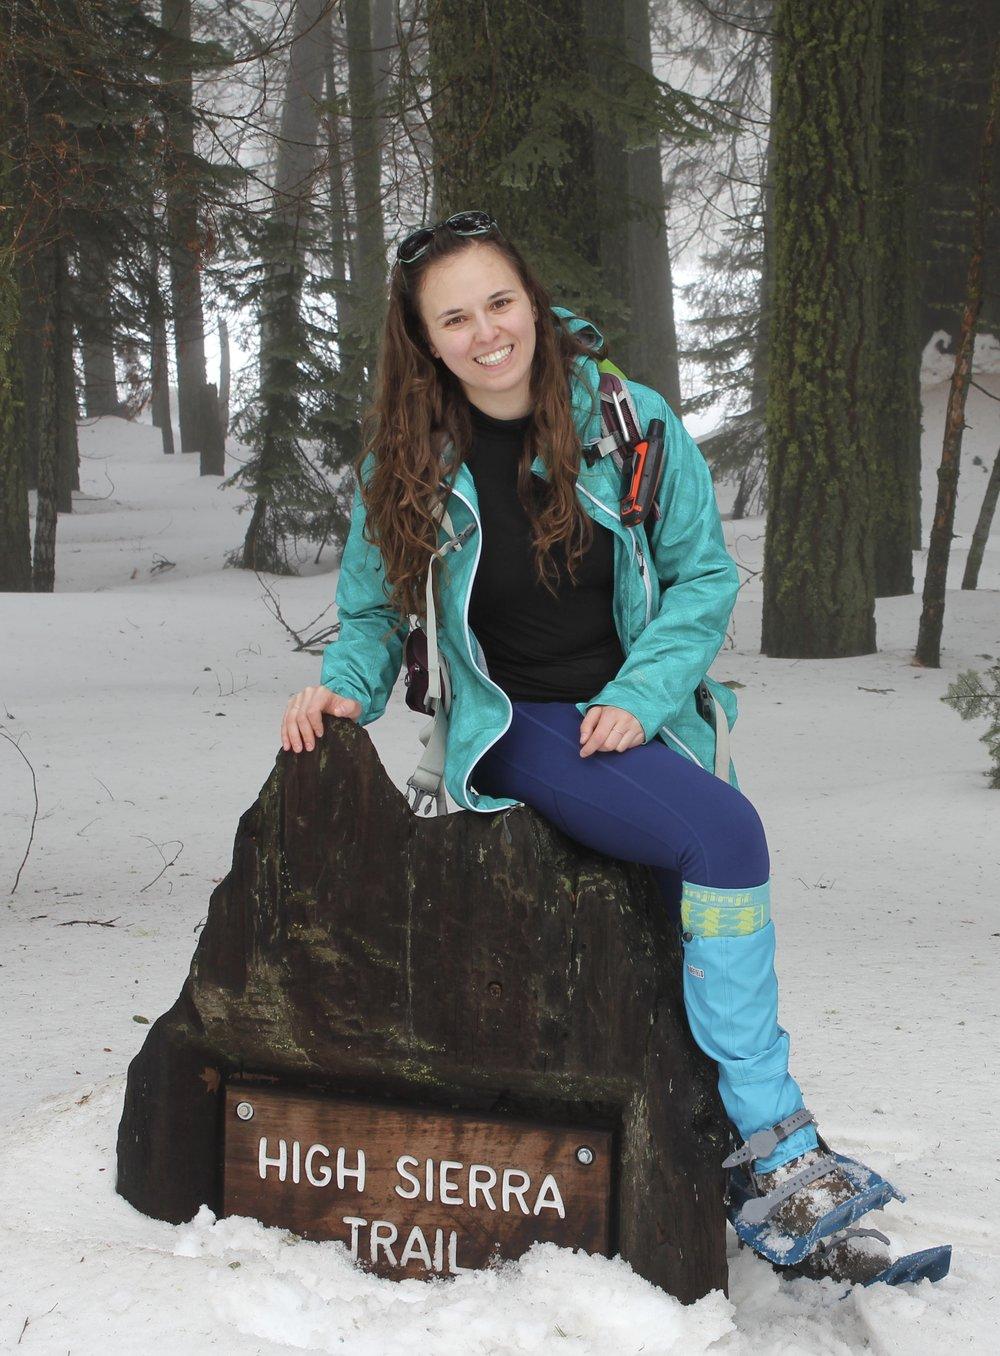 high sierra trail sign winter.jpg